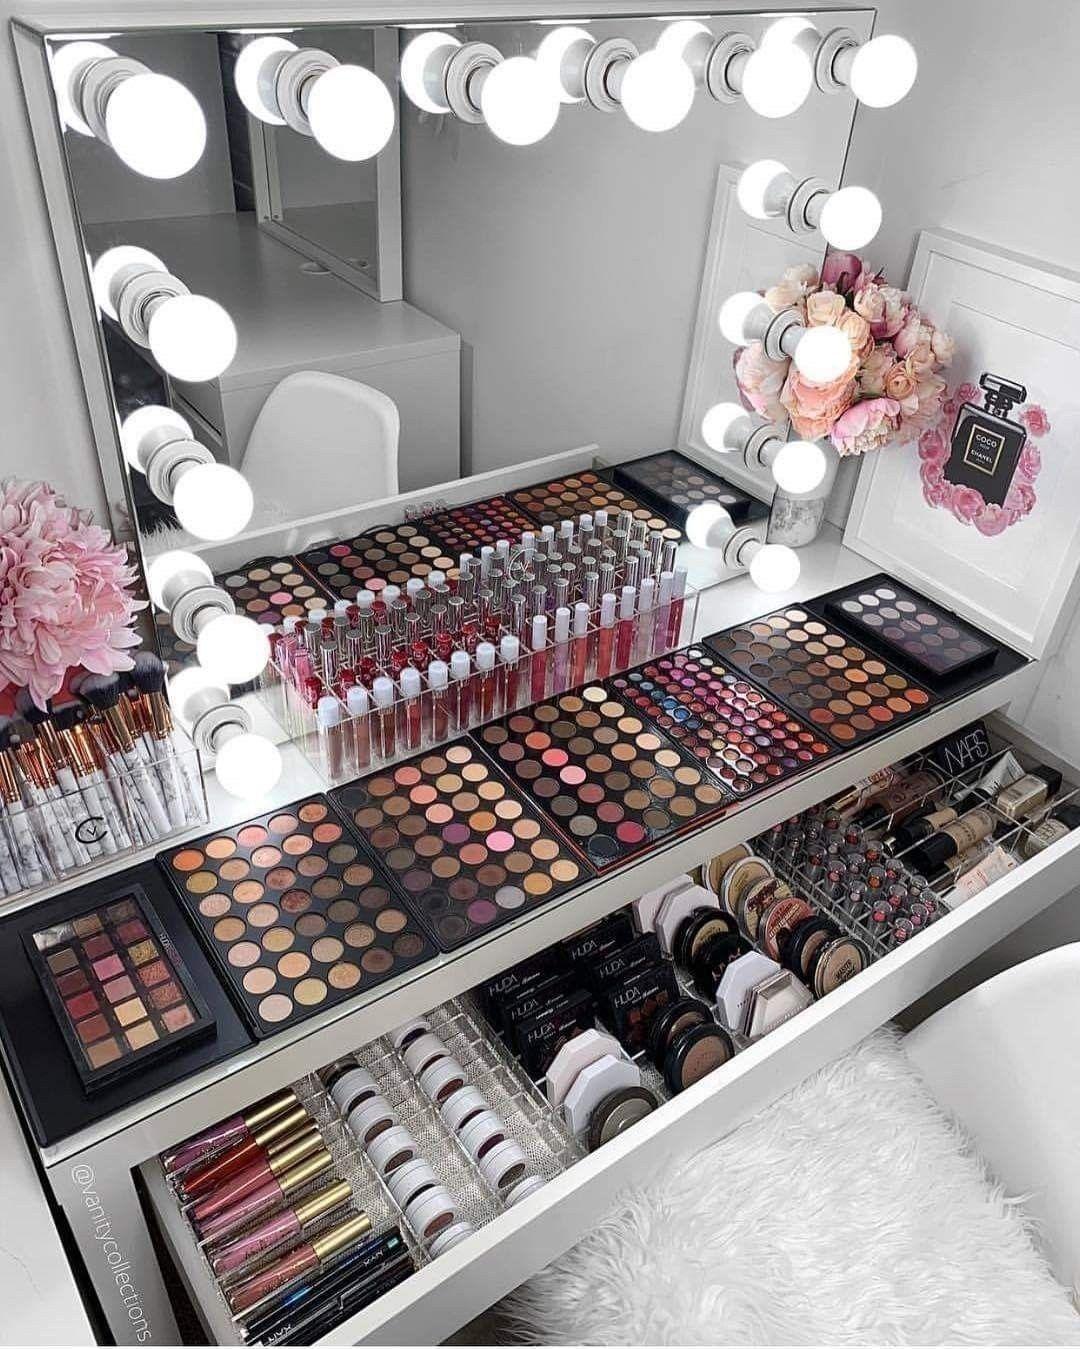 42 Gorgeous Makeup Room Organization Ideas - decoarchi.com